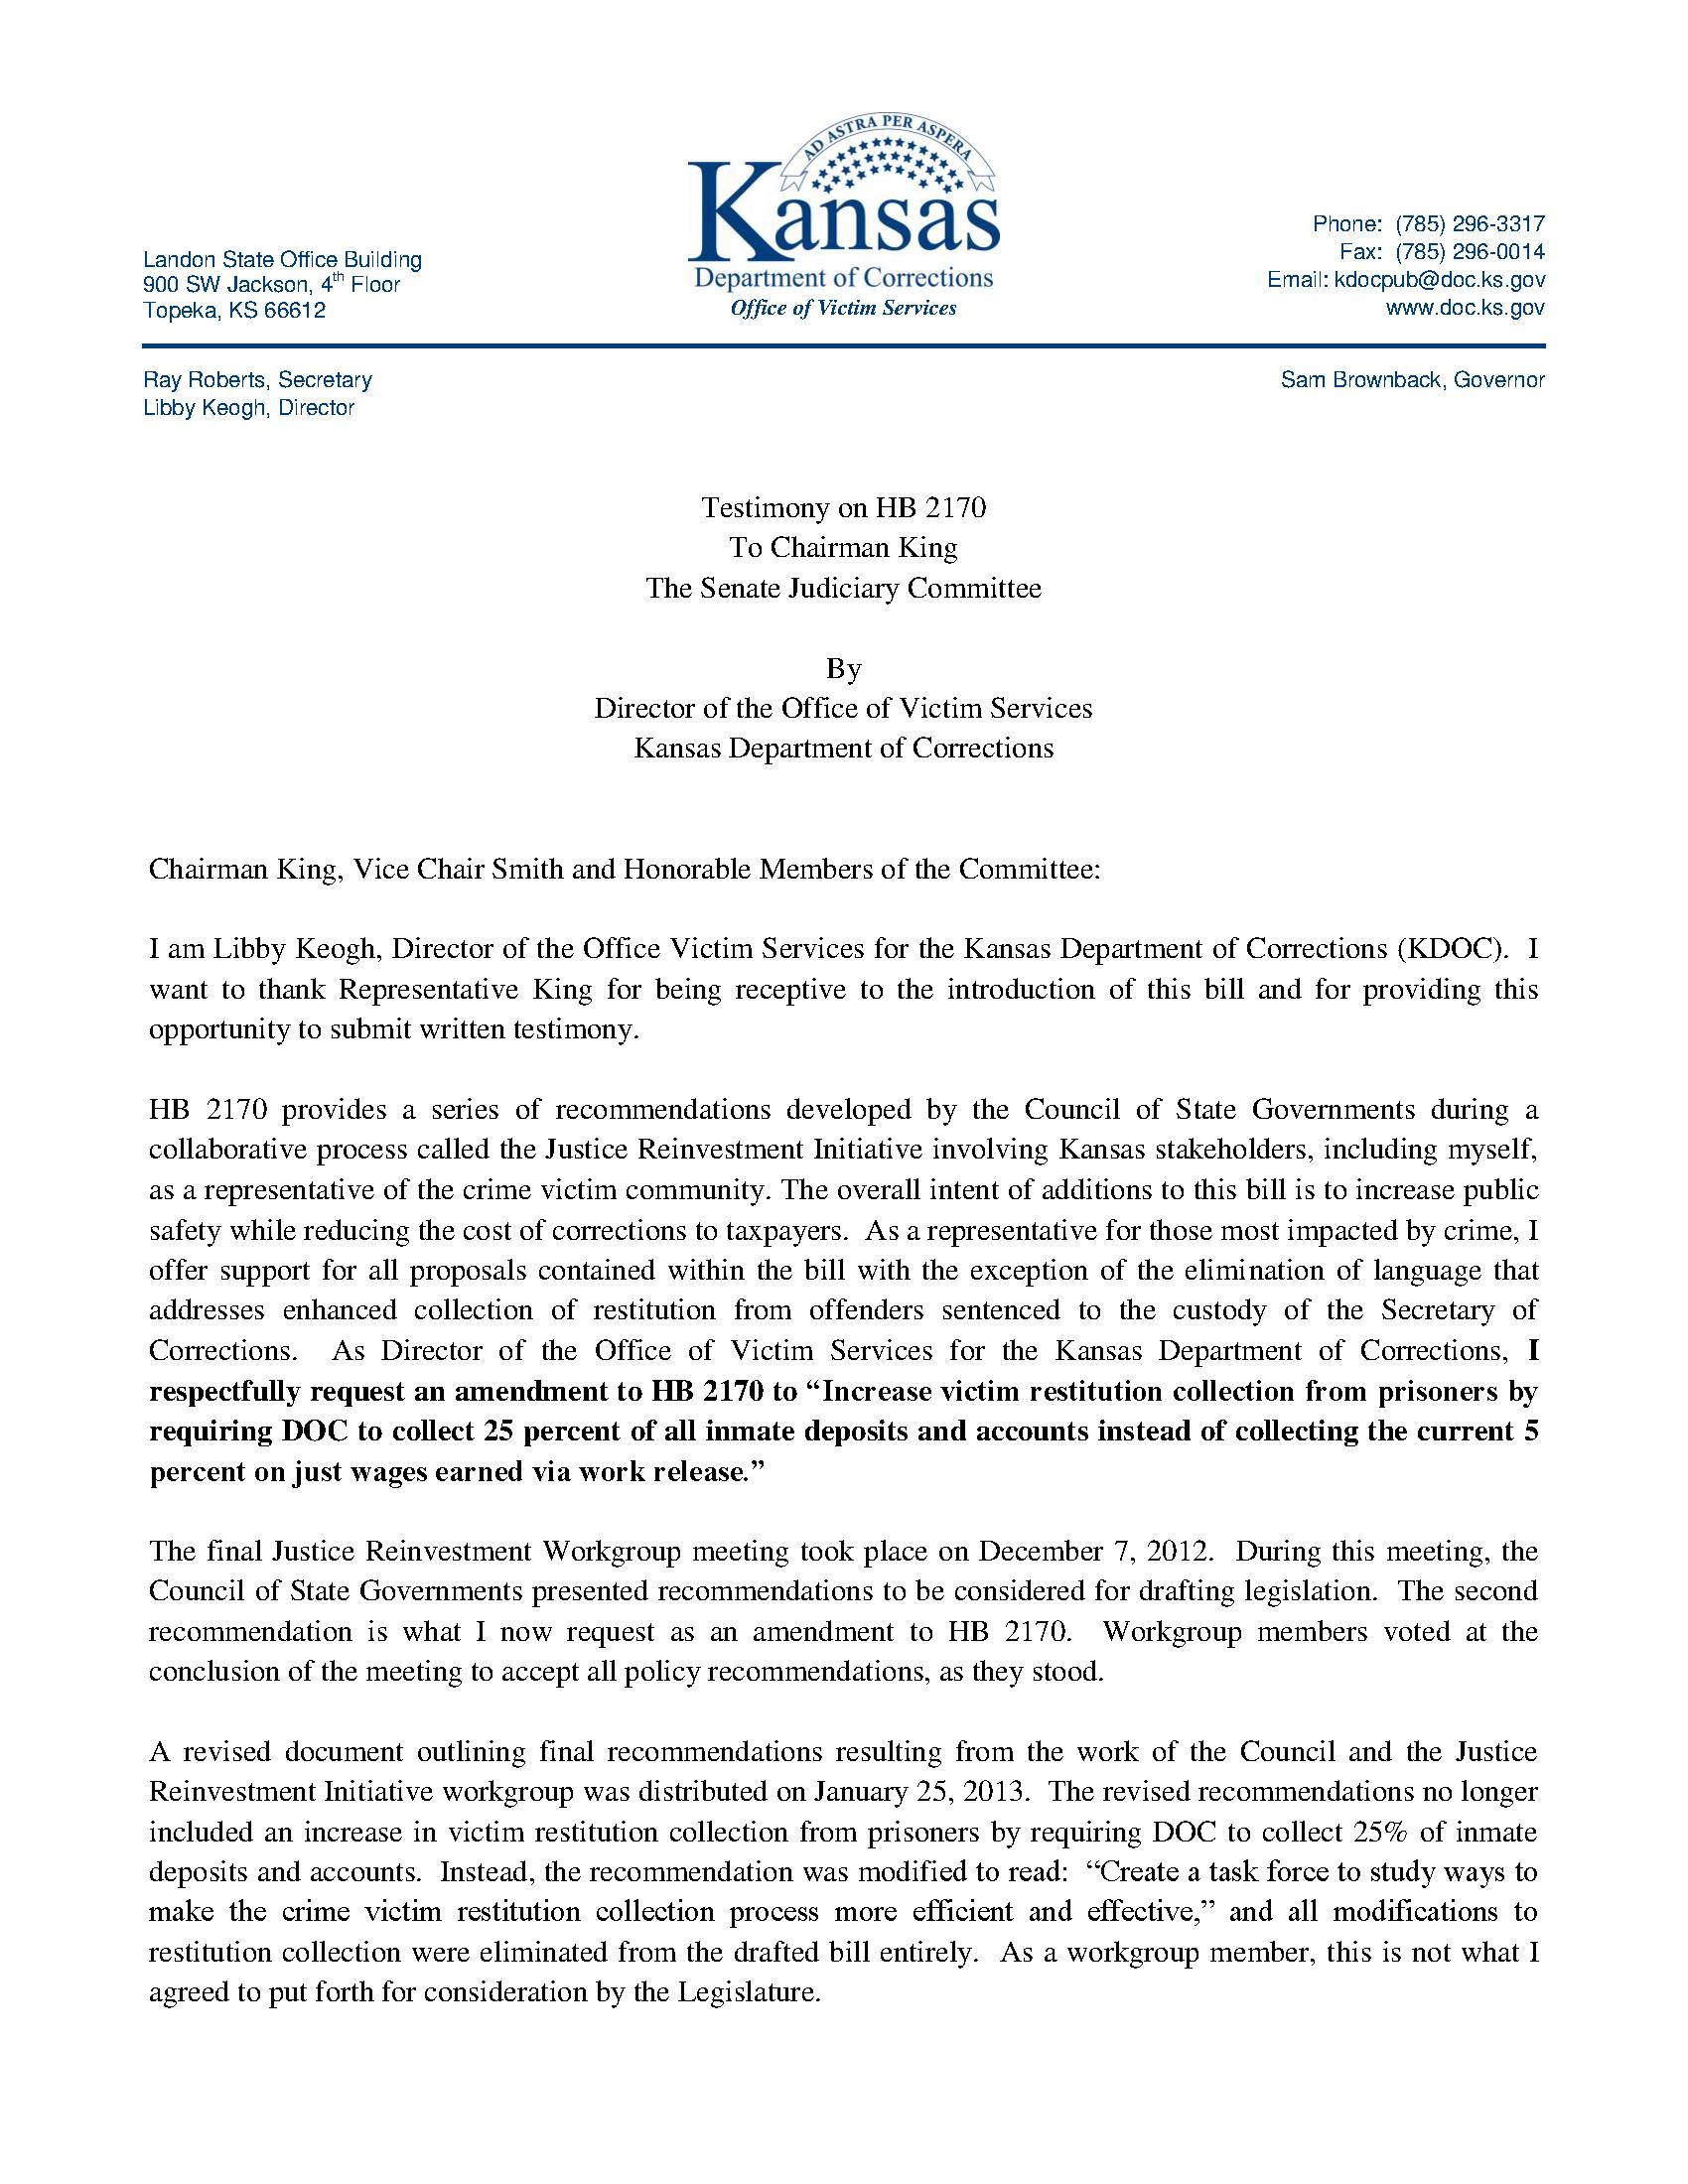 Testimony On Hb 2170 Kansas Department Of Corrections